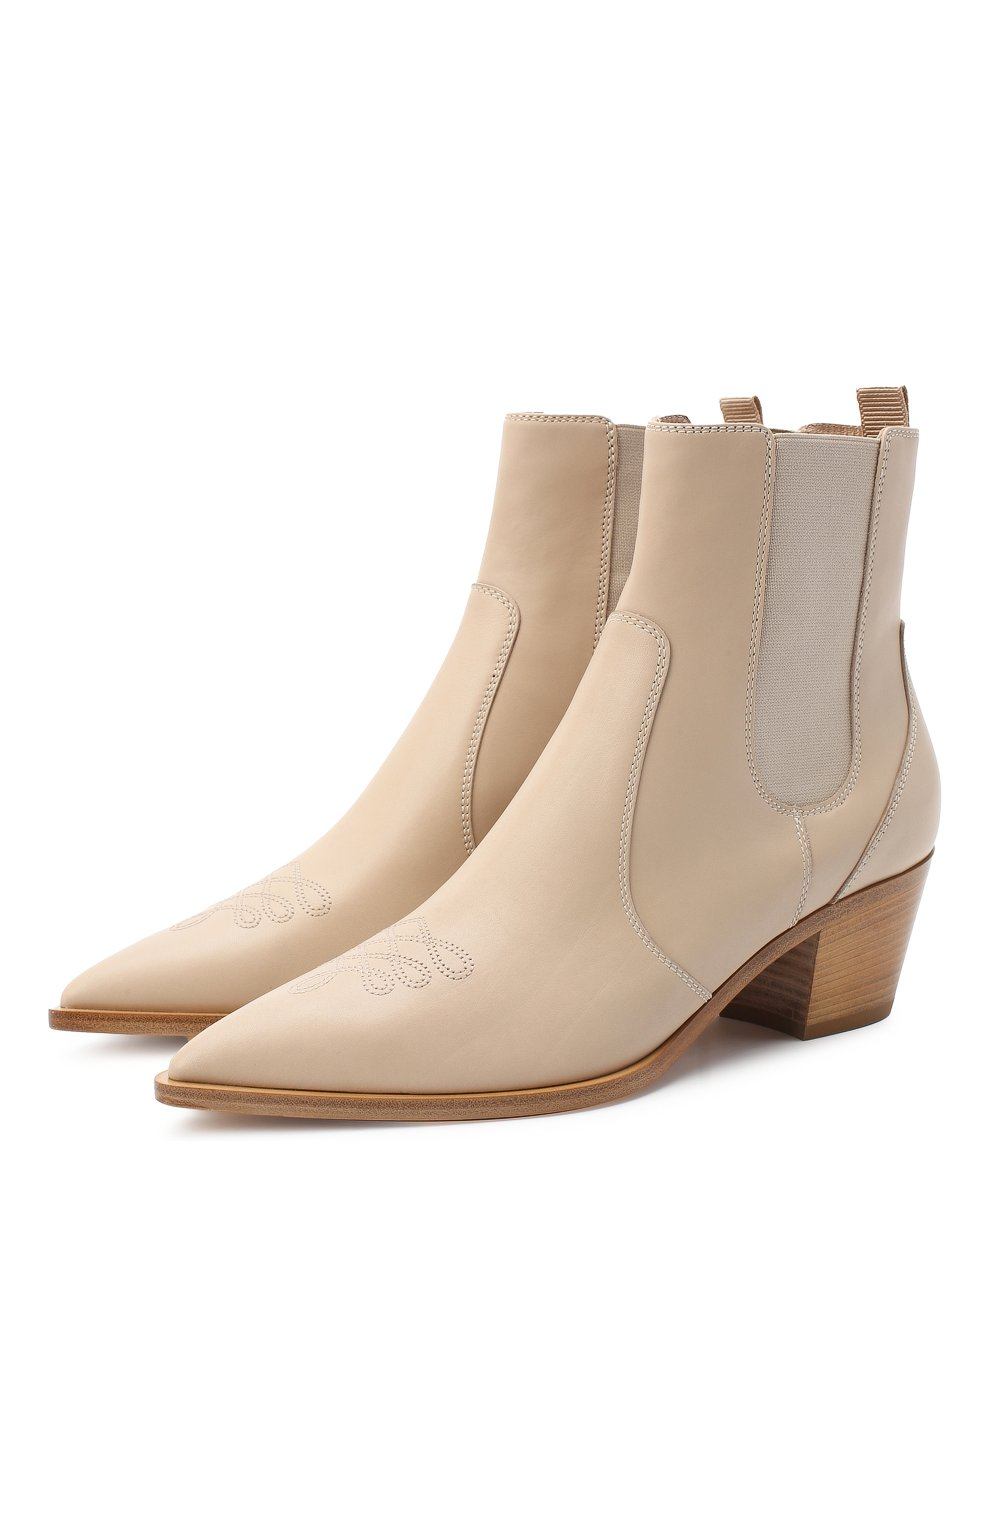 Женские кожаные ботинки GIANVITO ROSSI бежевого цвета, арт. G70343.45CU0.CLNM0US | Фото 1